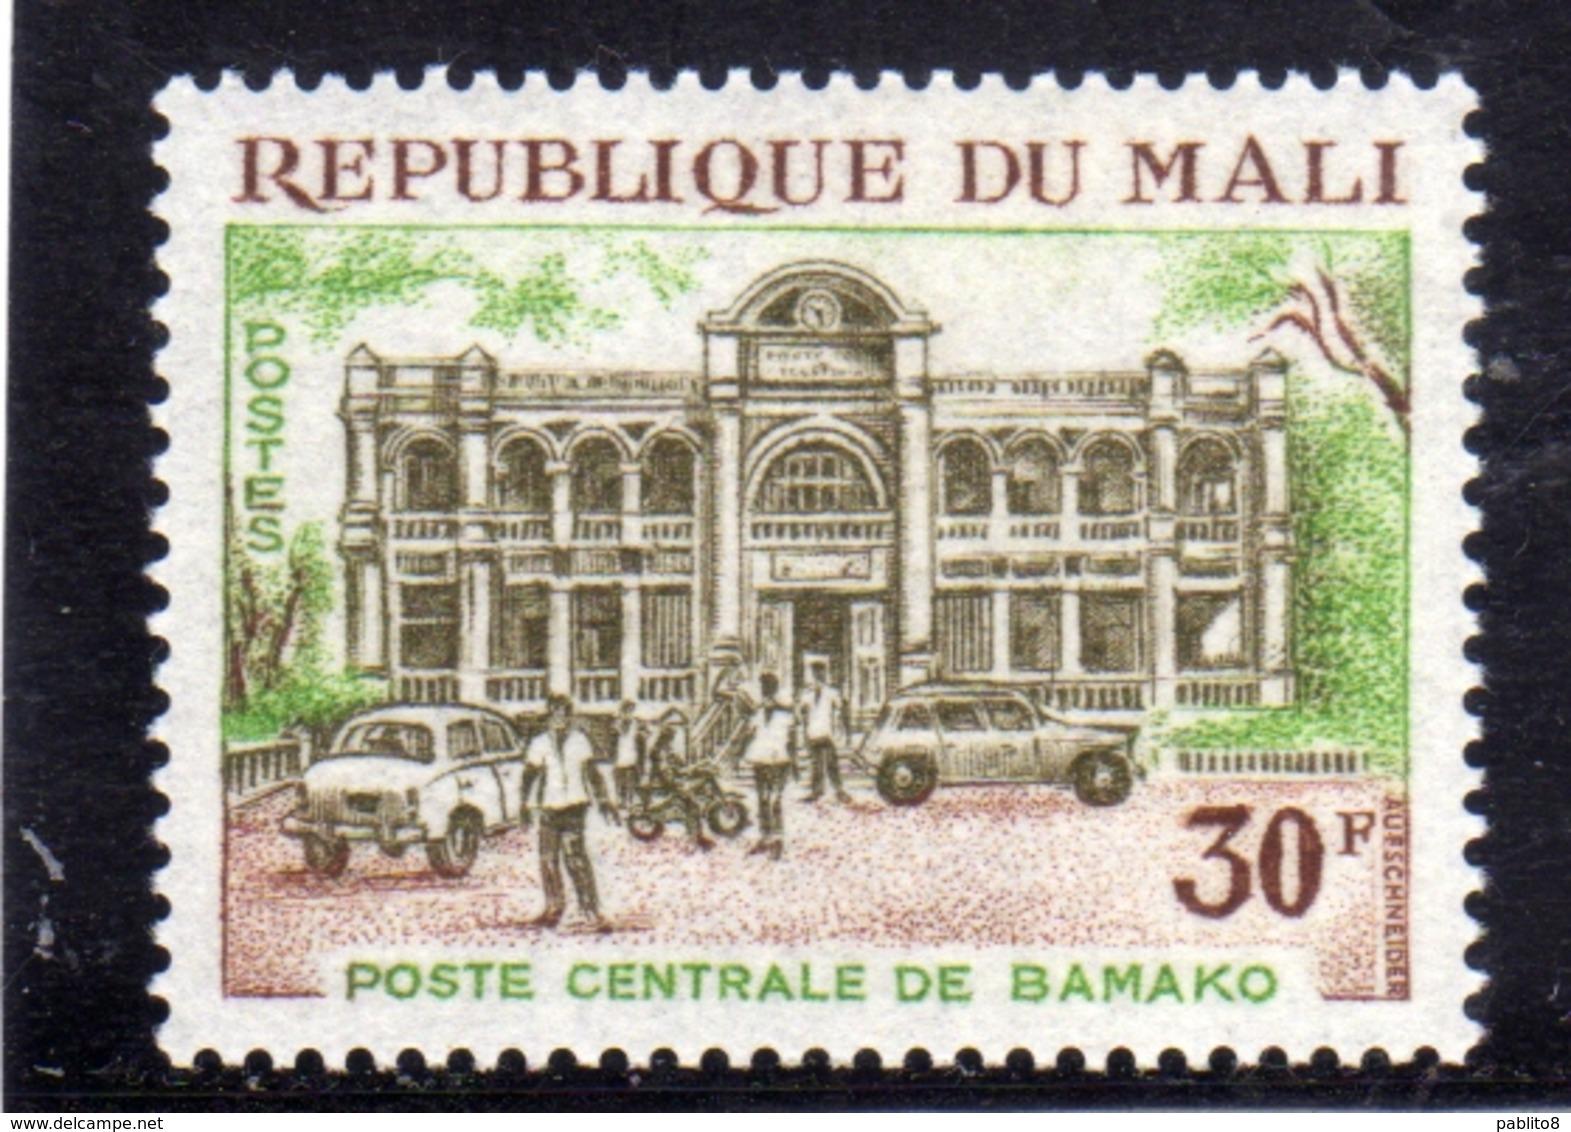 MALI 1970 PUBLIC BUILDINGS CENTRAL POST OFFICE POSTE CENTRALE BAMAKO 30f MNH - Mali (1959-...)